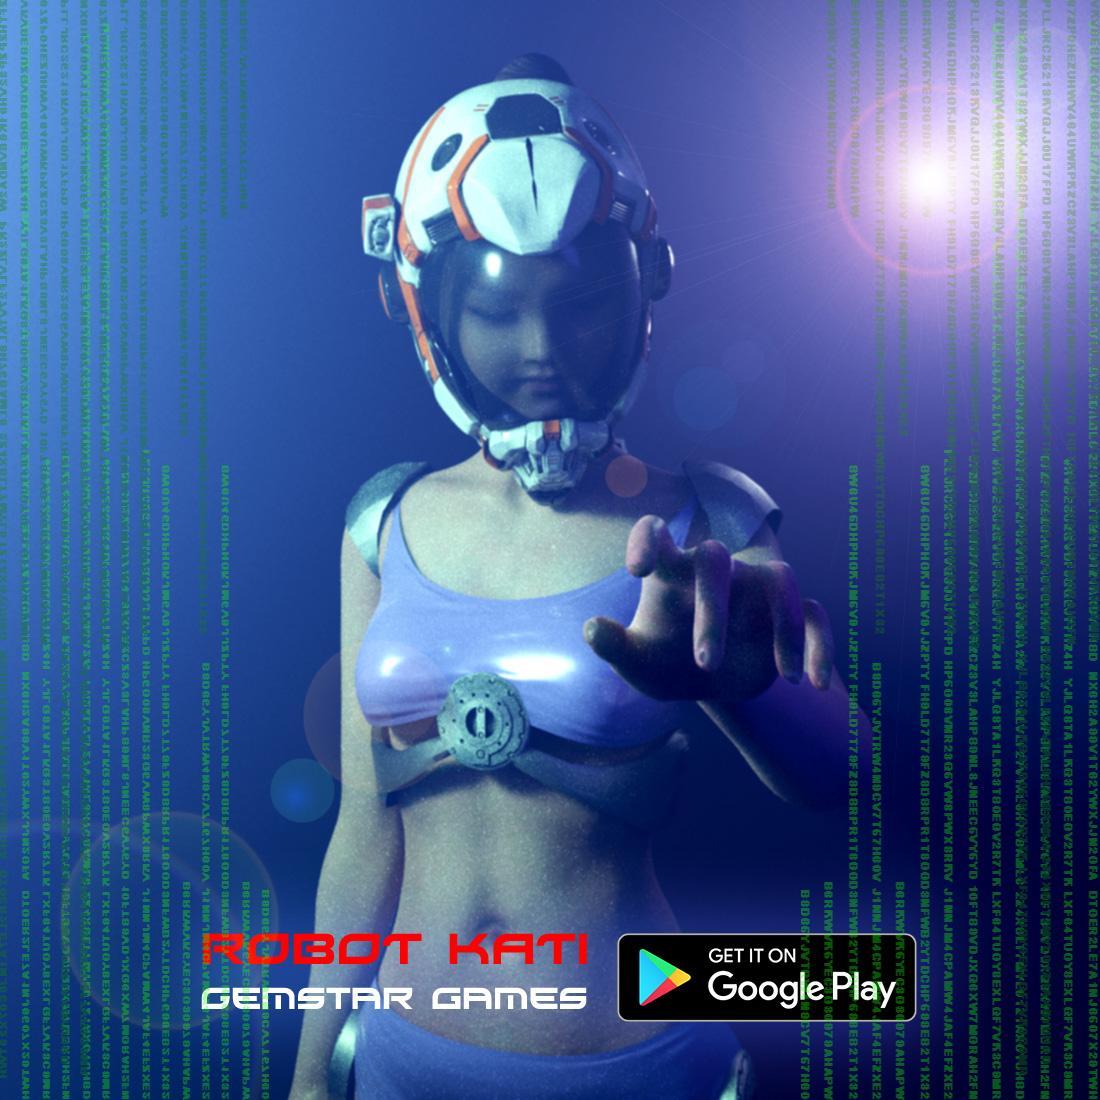 ANDROID: 로봇 캐티 인비테이셔널 (La Robot Kati se lo carga todo) - GRATIS